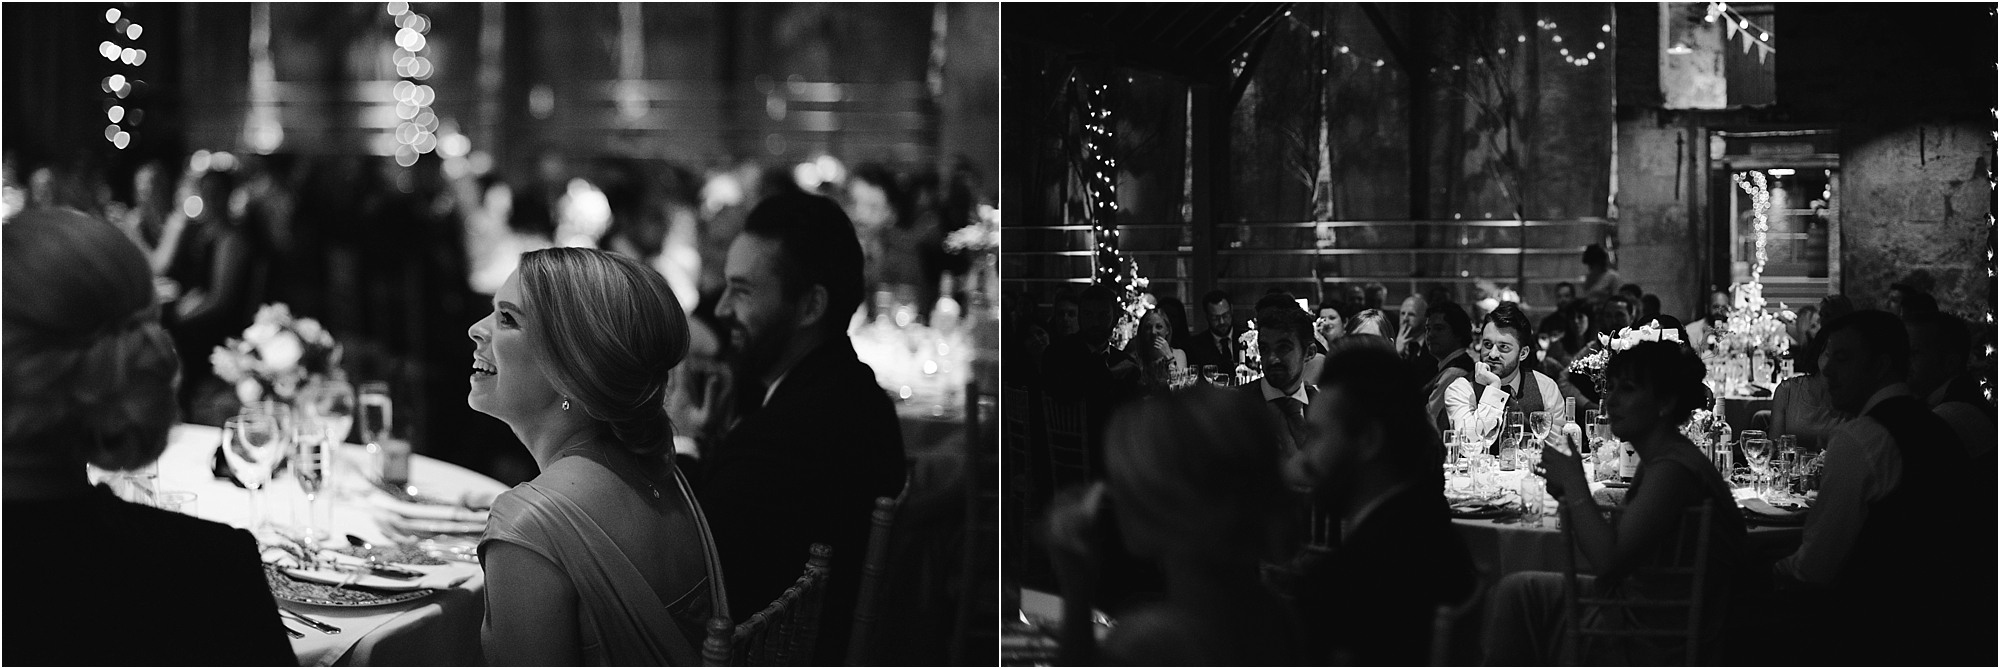 Scott+Joanna-Kinkell-Byre-wedding-fife-photography__0084.jpg